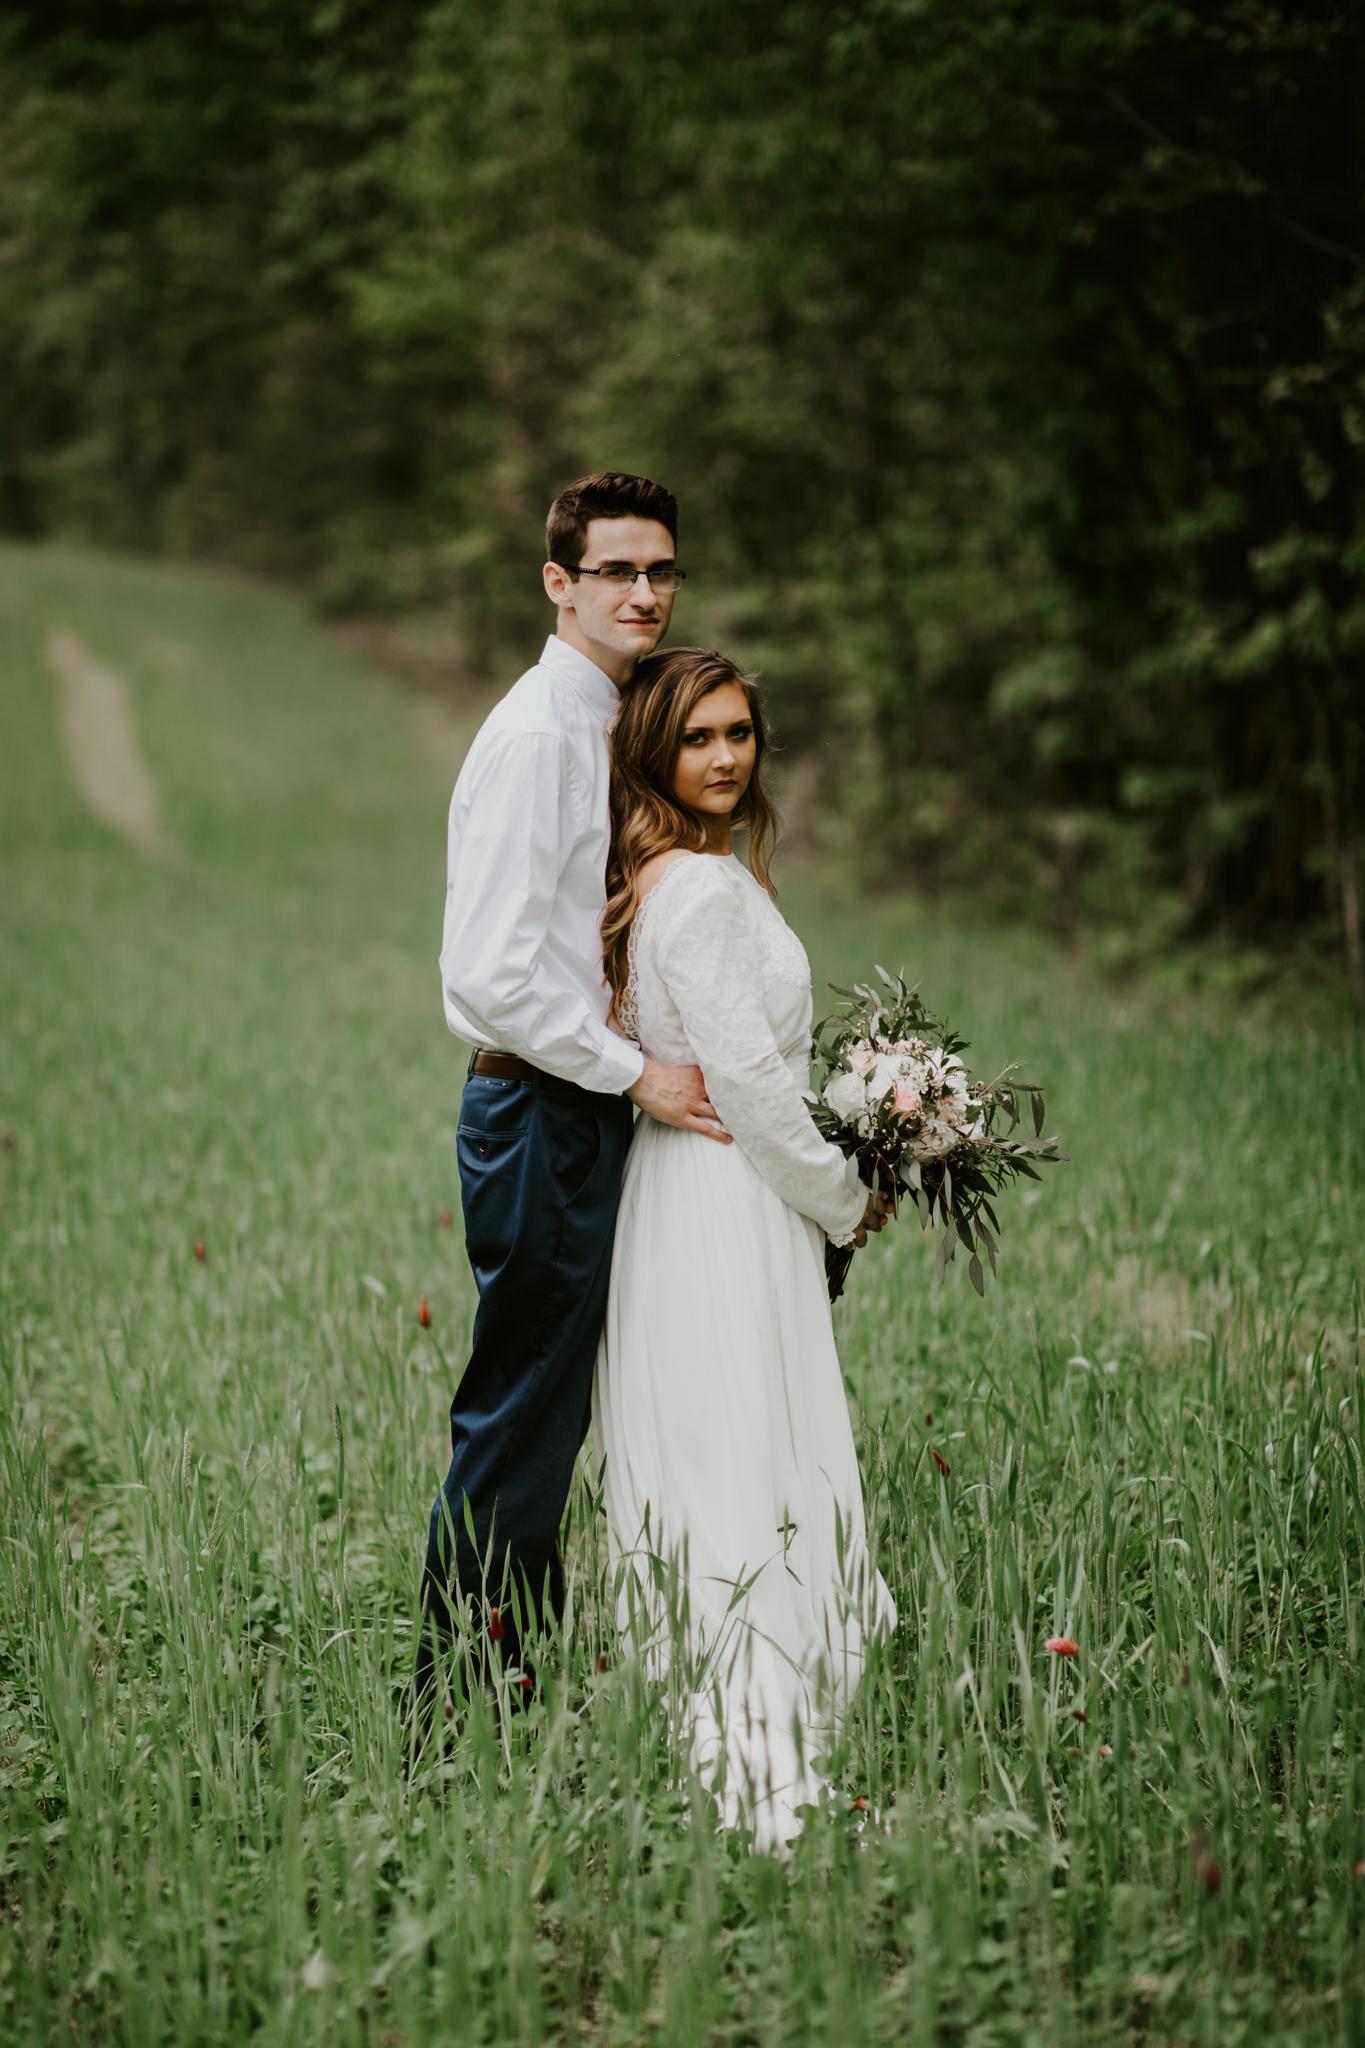 Lacey-Joe-Chattanooga-Nashville-Tennessee-Wedding-Elopement-Photographer-190.jpg